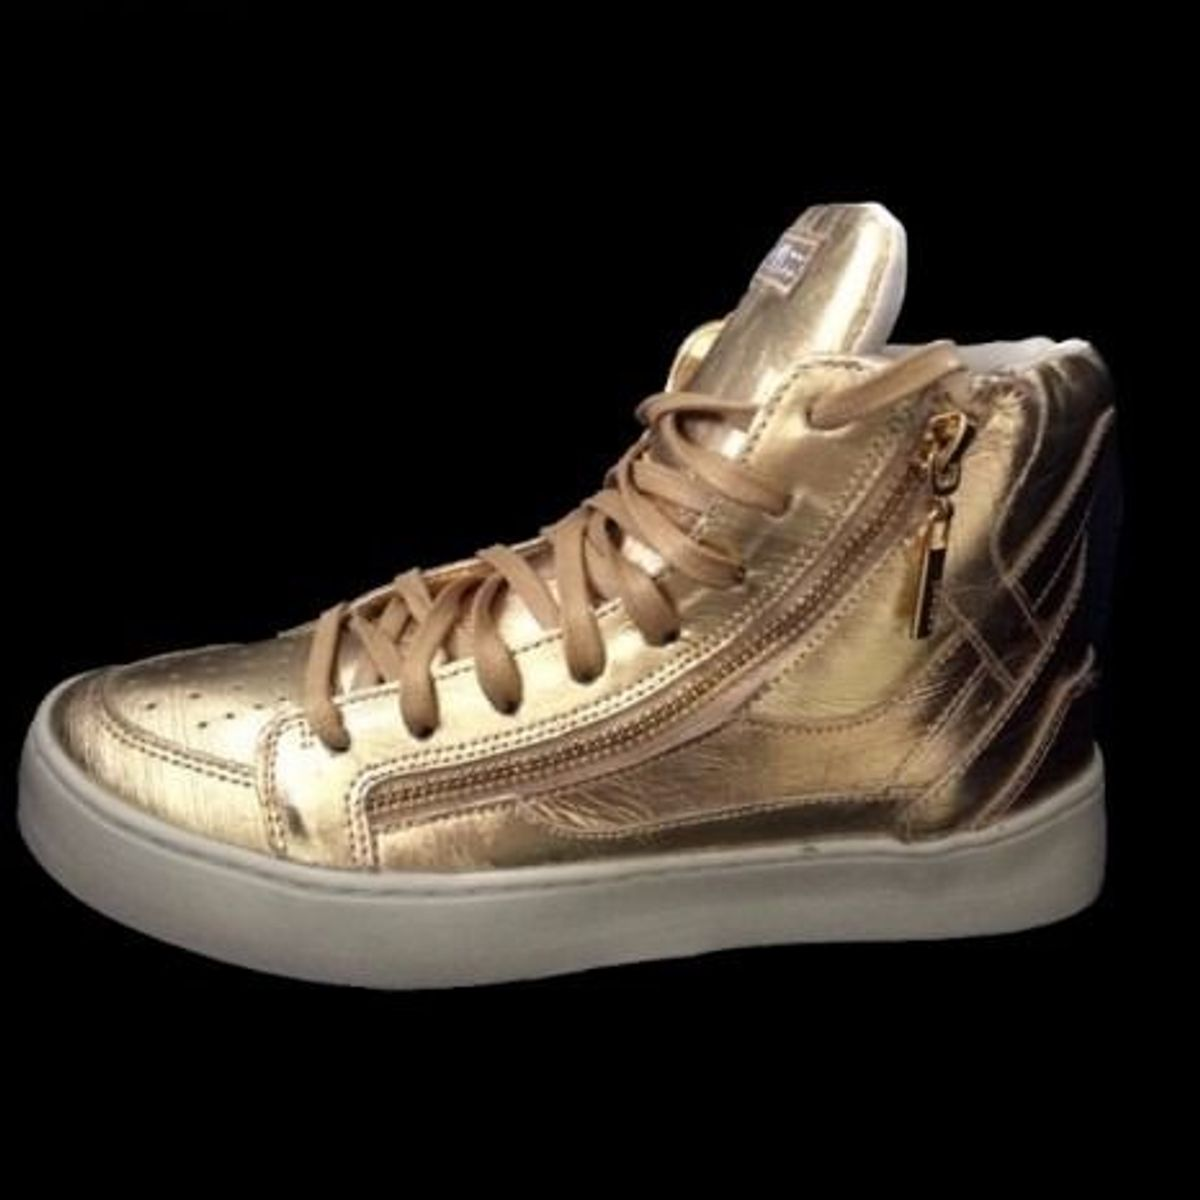 72f2056b2 Tênis Colcci Fitness Branco Dourado Feminino | Tênis Feminino Colcci Nunca  Usado 32422174 | enjoei